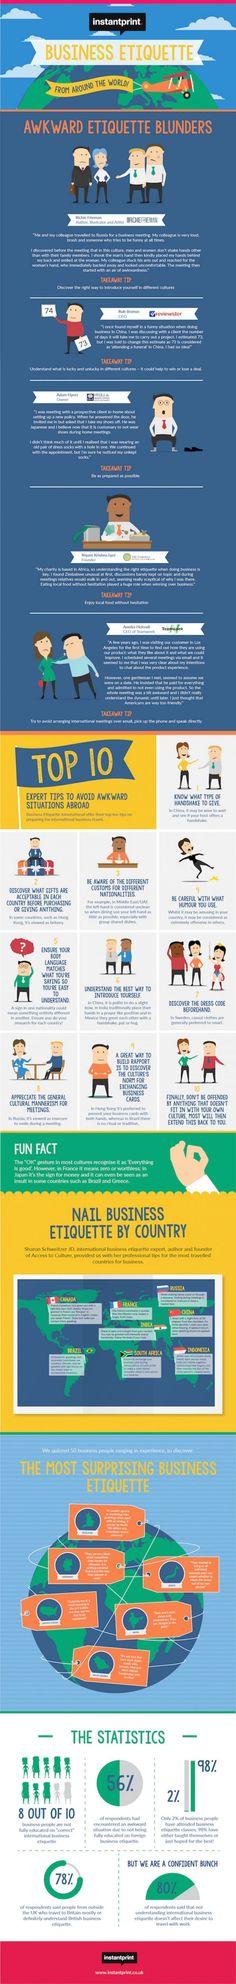 Infographic business etiquette